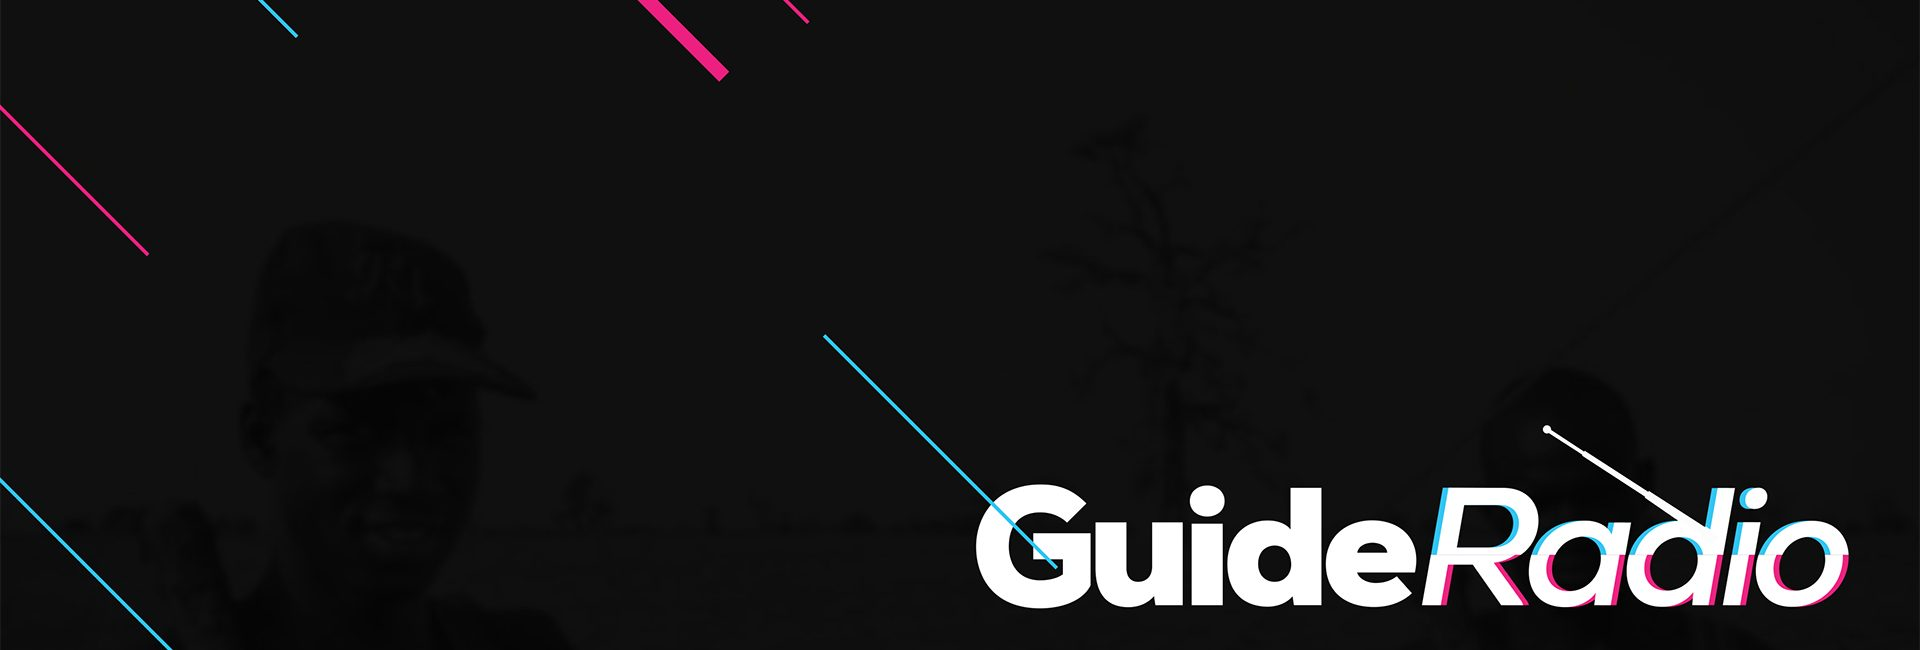 Guide-Radio